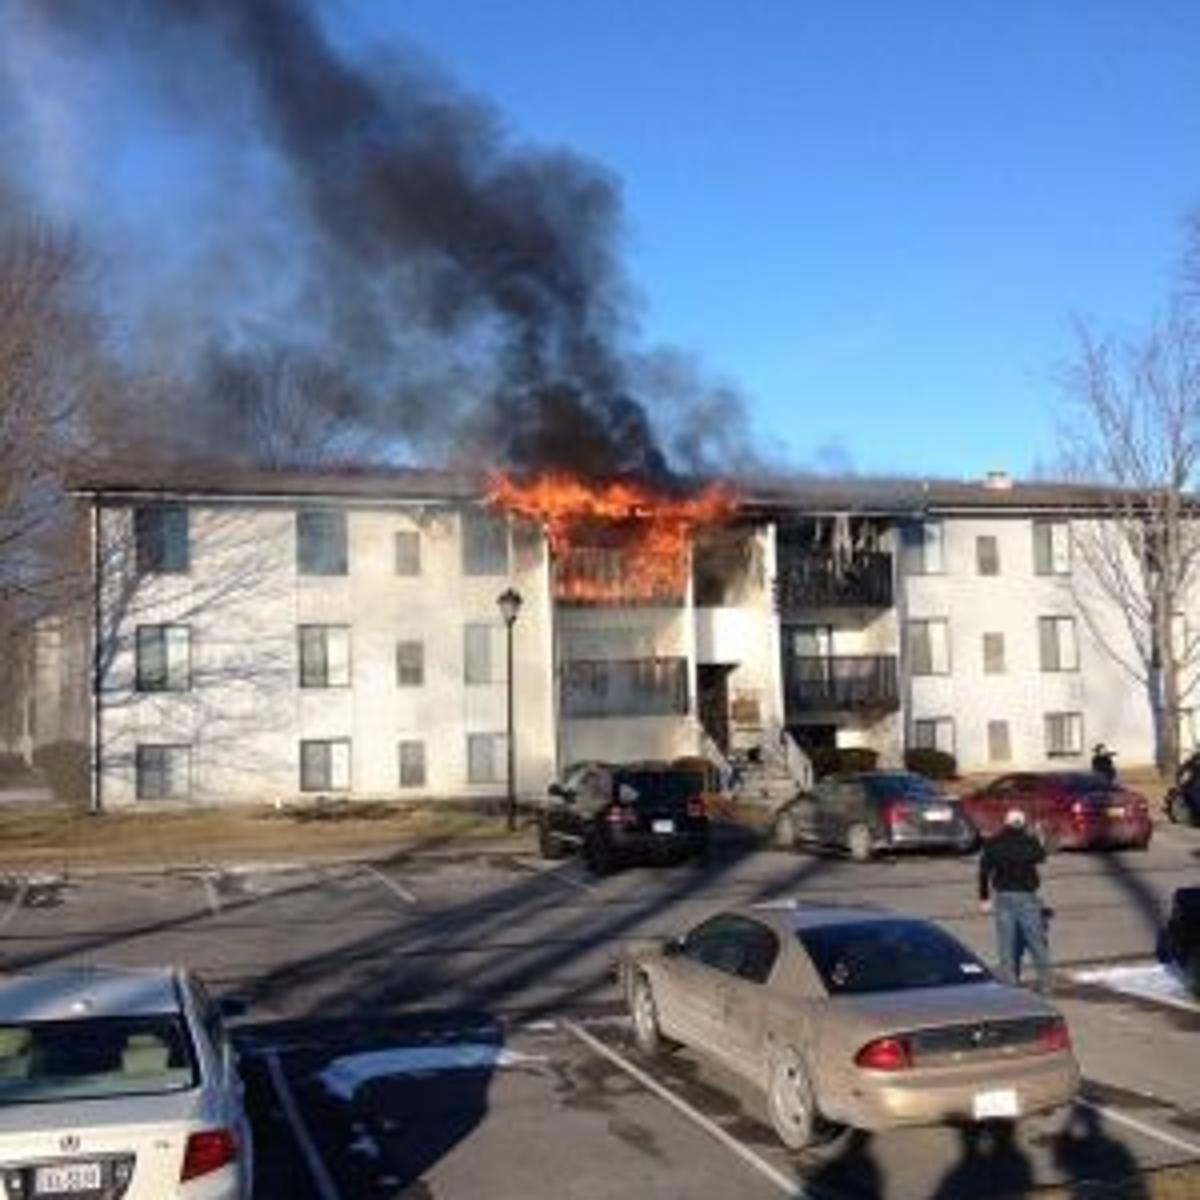 Dozens displaced by fire at Foxridge apartments in Blacksburg